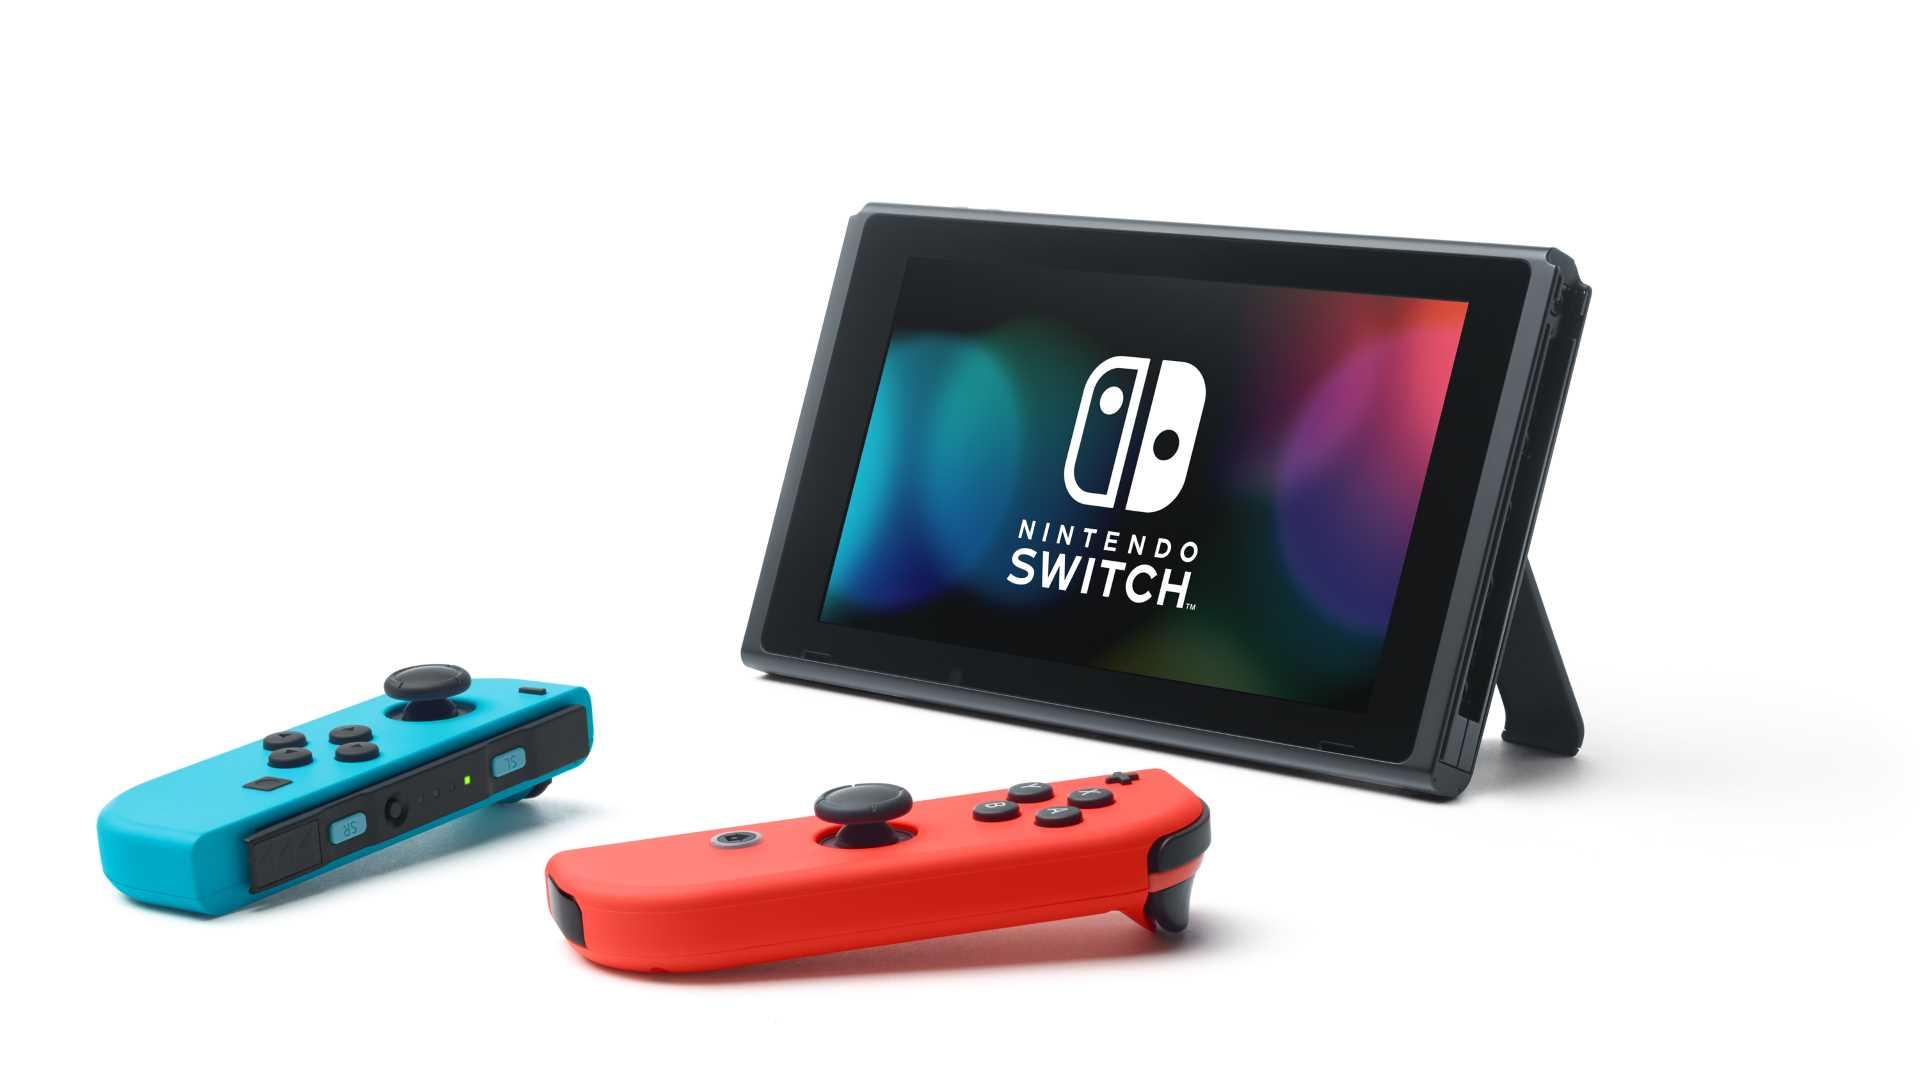 Nintendo Switch review - joycons